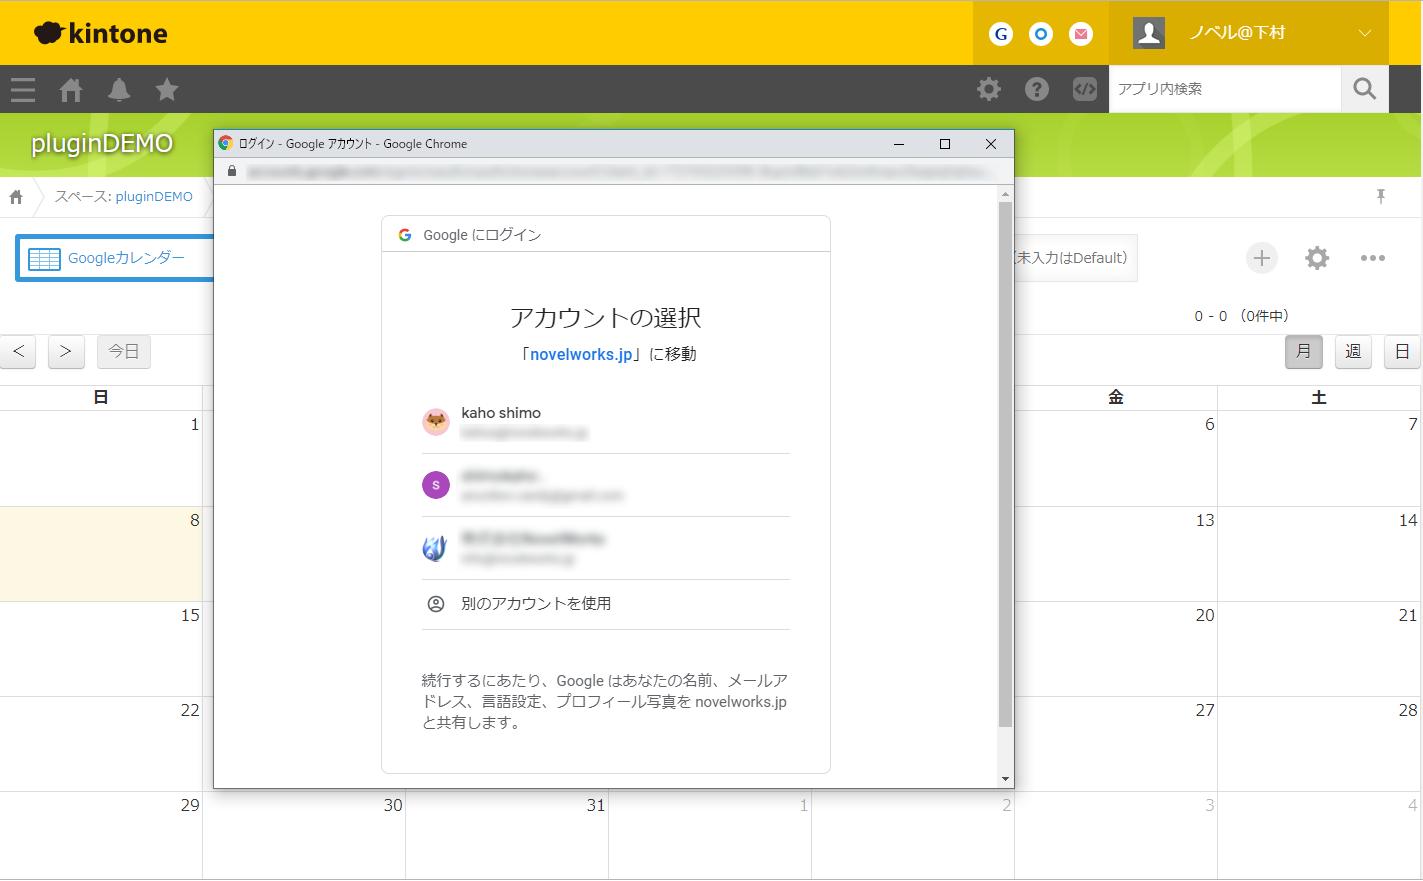 [kintone-google双方向連携]連携設定_google2